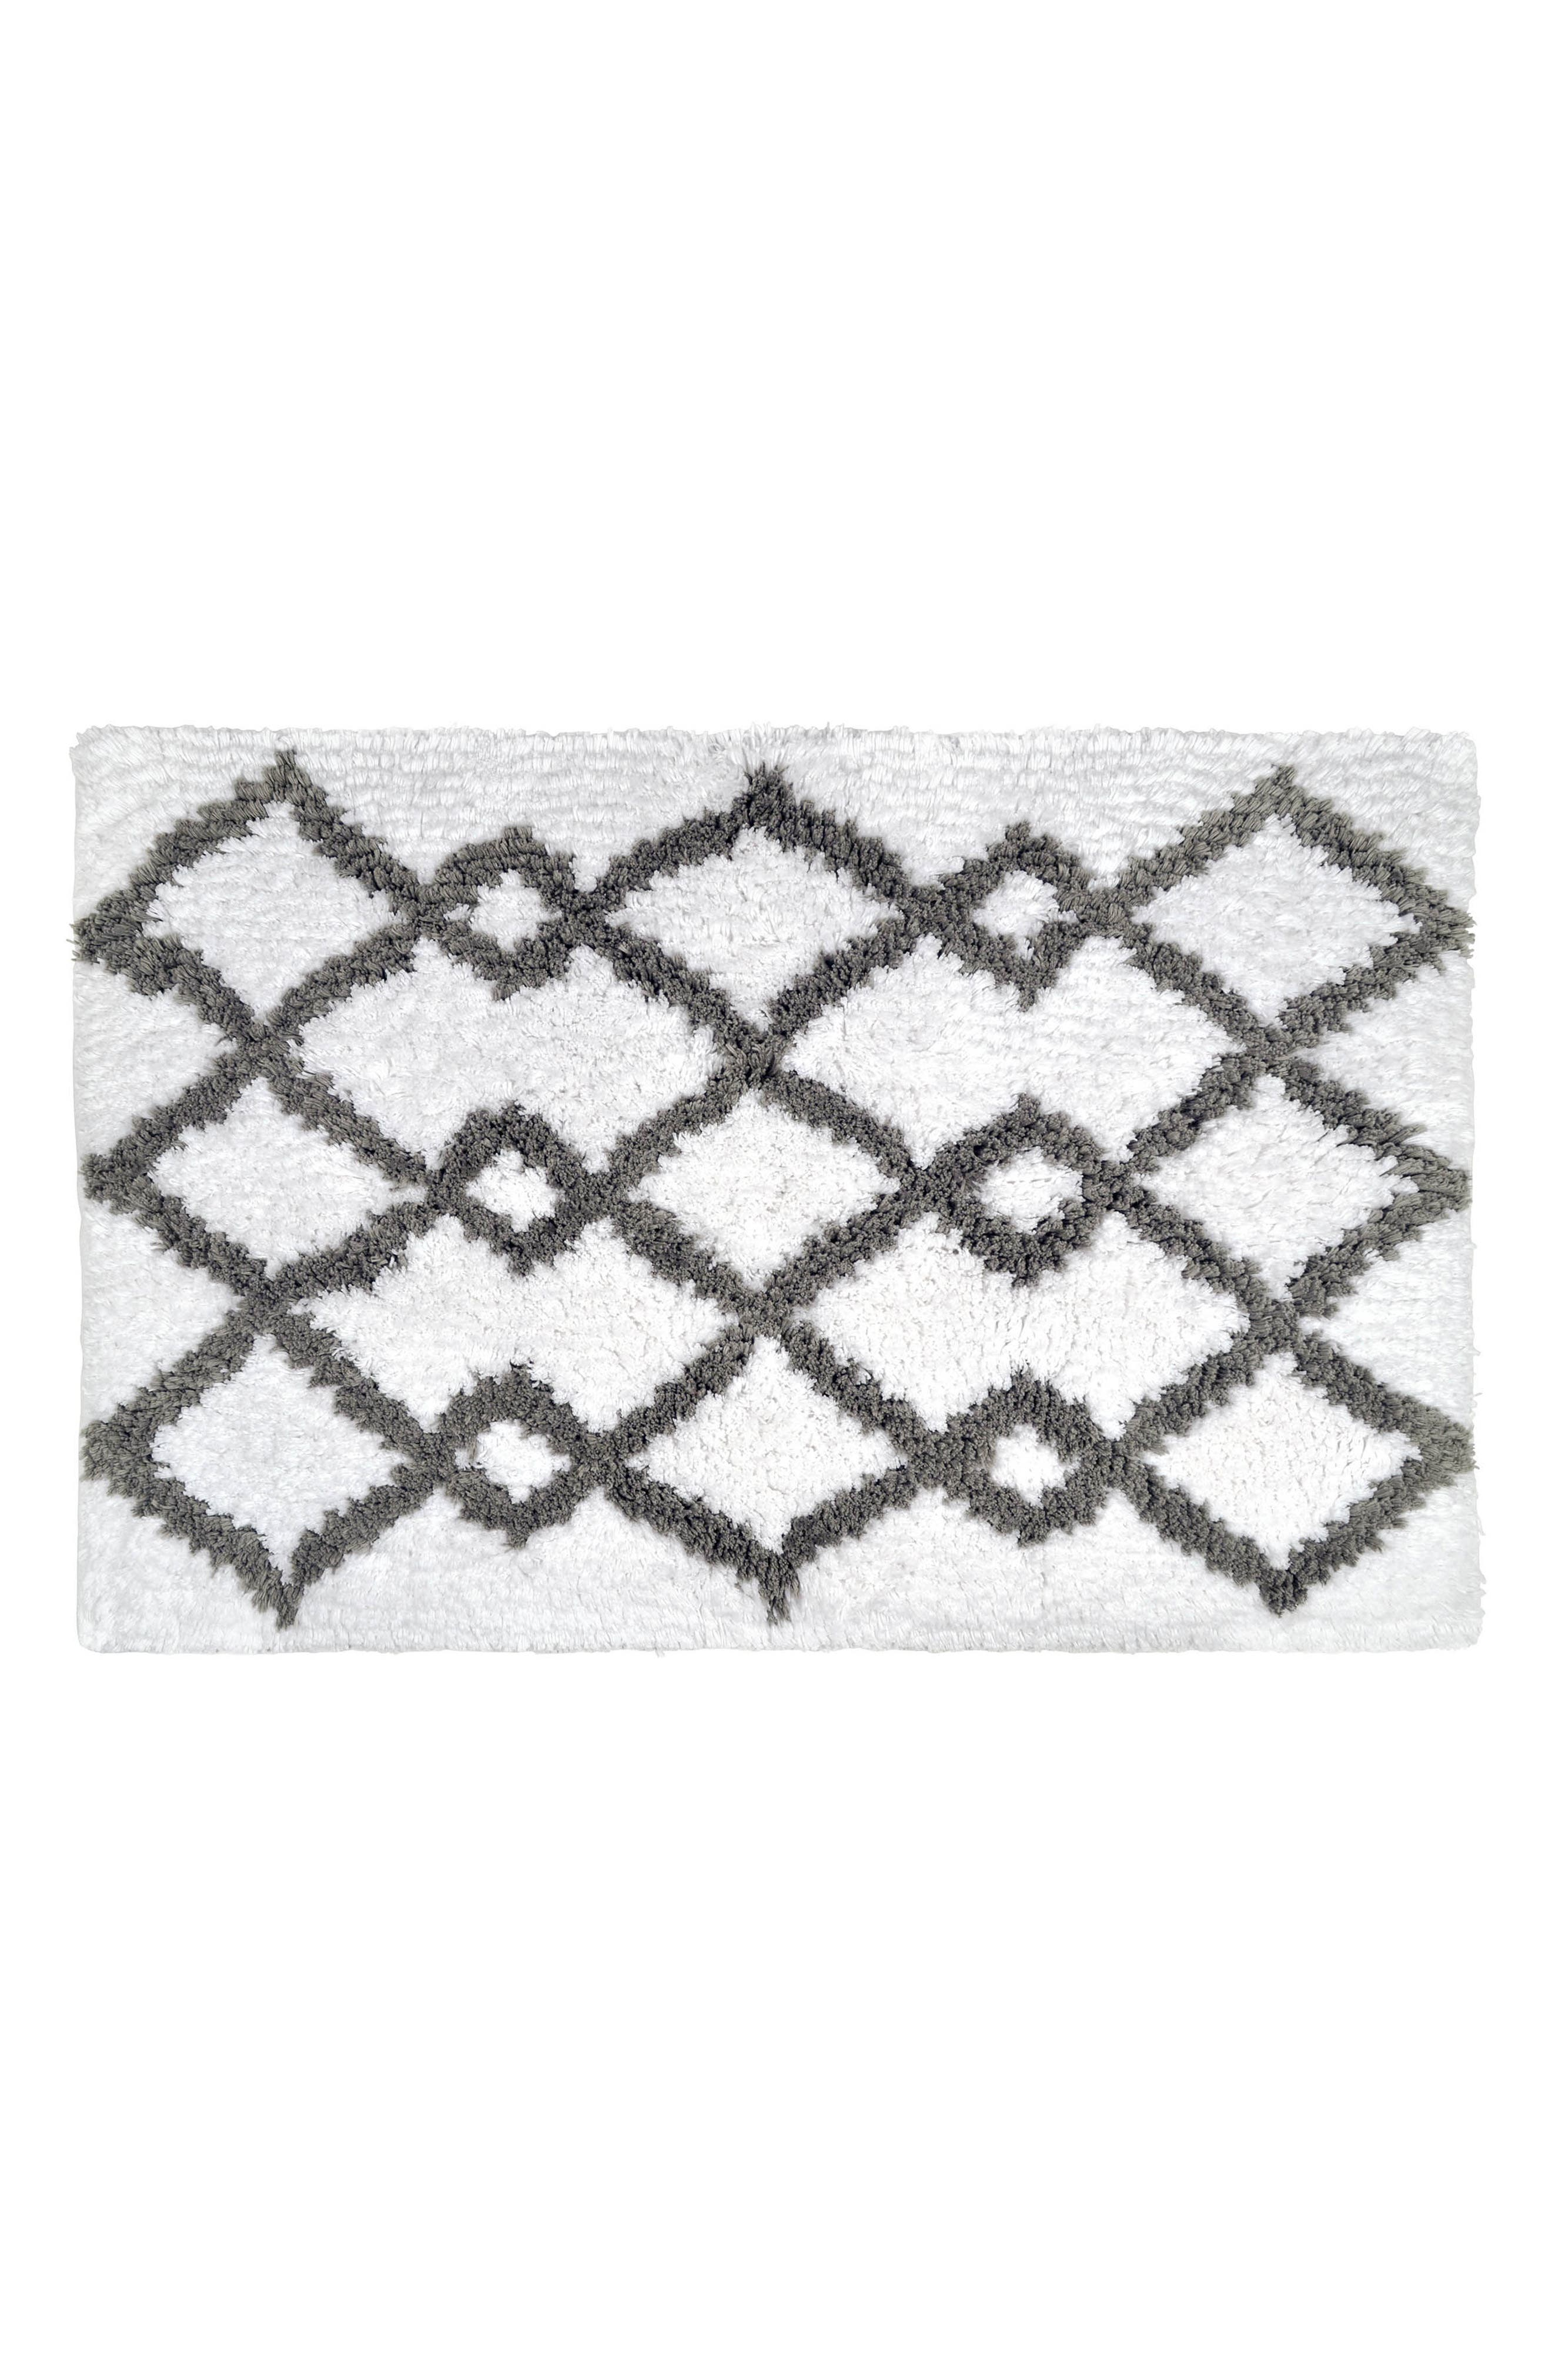 Hali Handwoven Bath Rug,                             Main thumbnail 1, color,                             Grey/ White